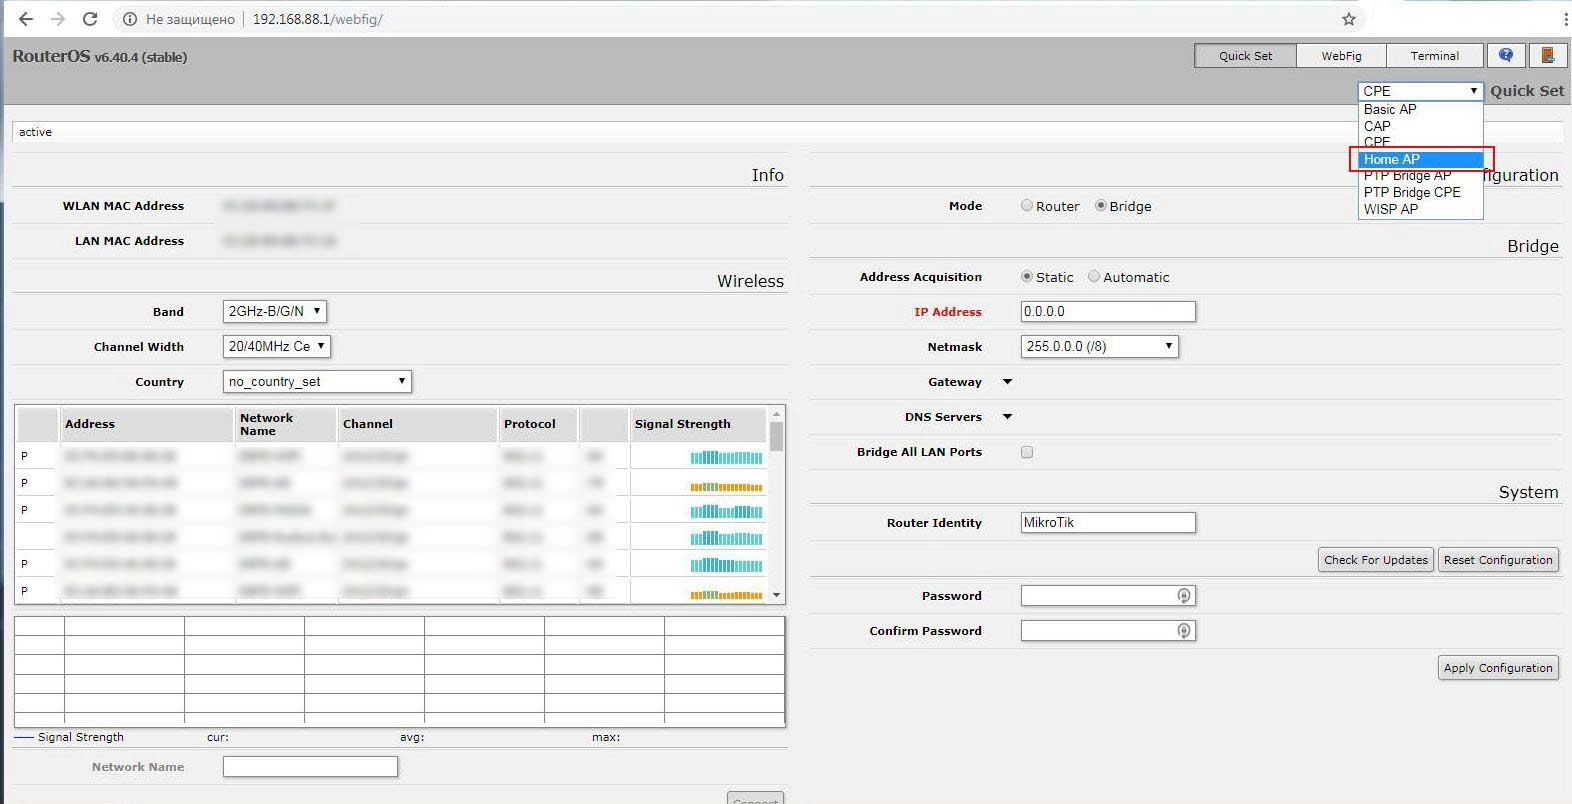 Базовая настройка роутера MikroTik (скриншот 11)